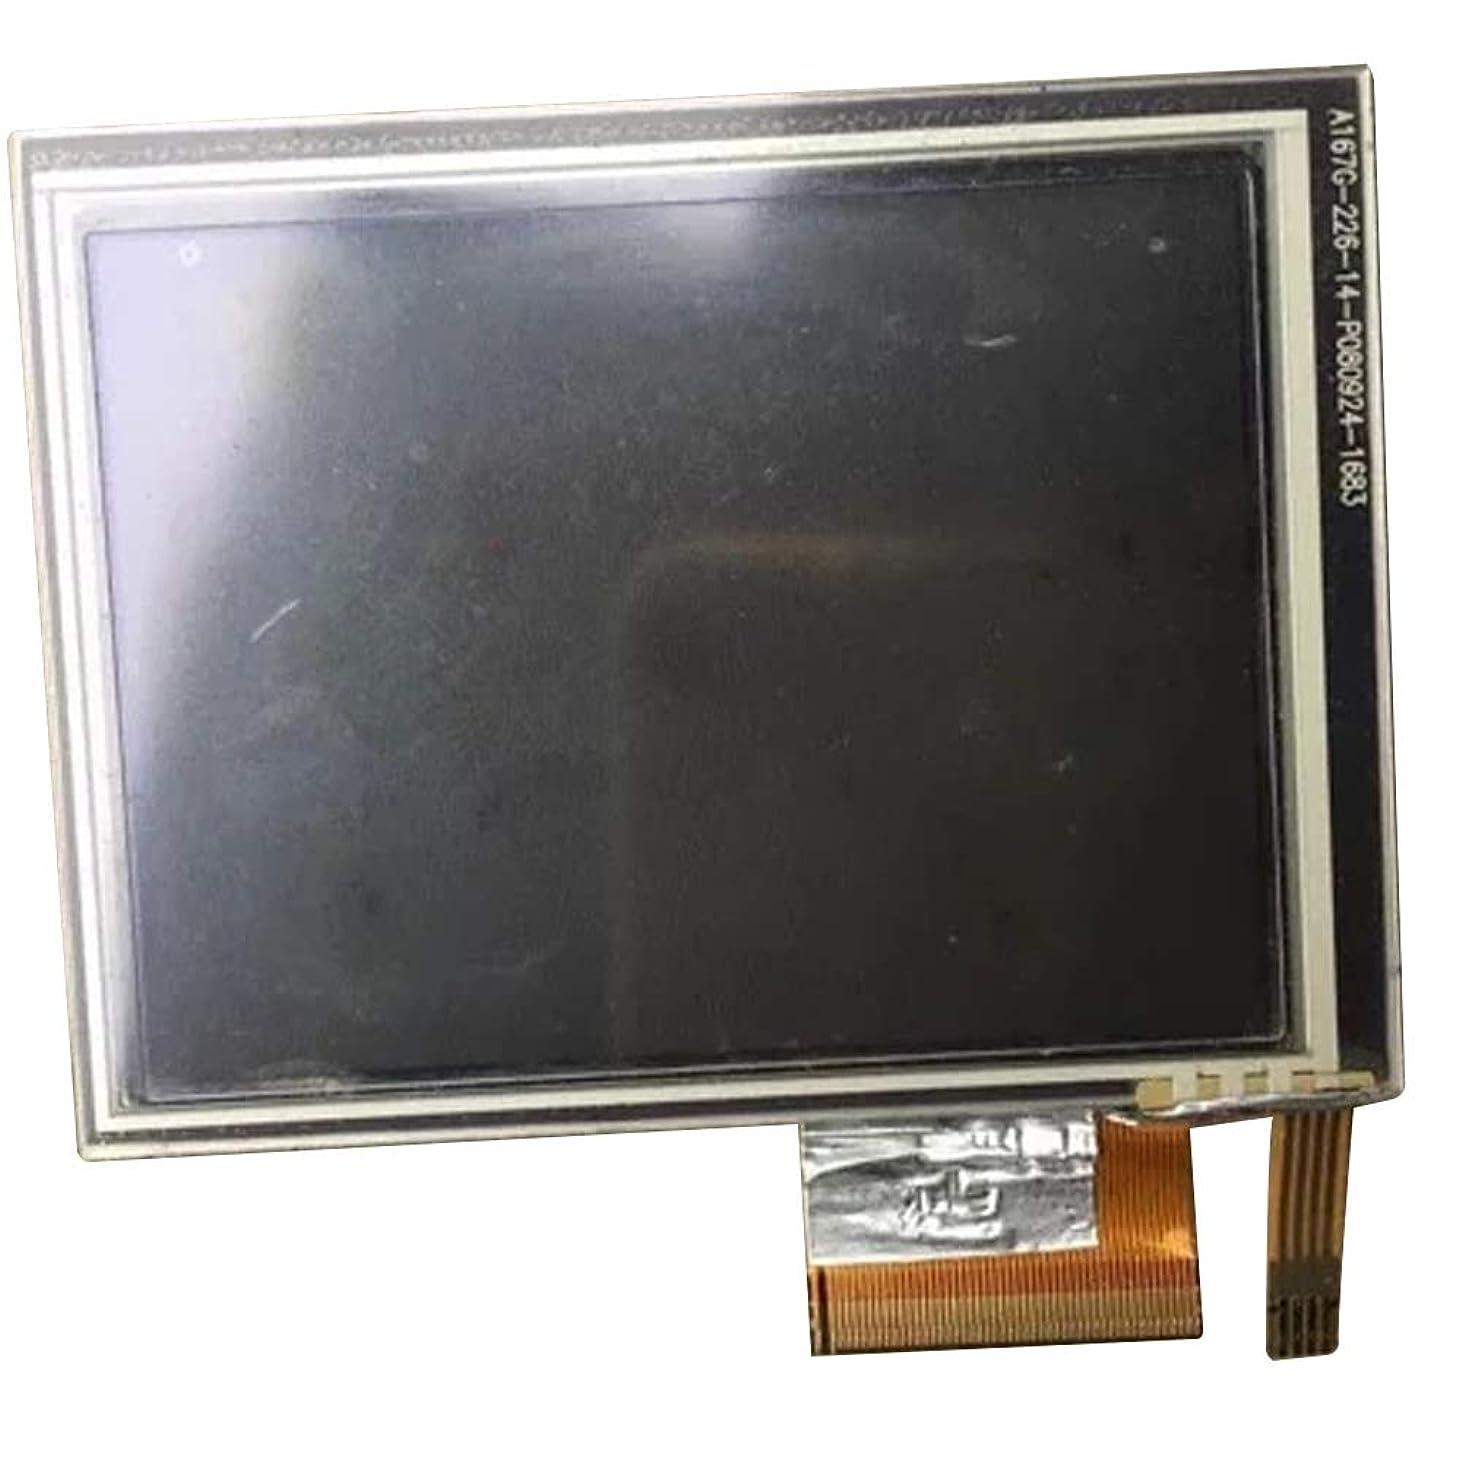 L&W 3.5 inch LCD Display Screen for Navigation Model Name LQ035Q7DH06 by L&W LCD lrgja601811